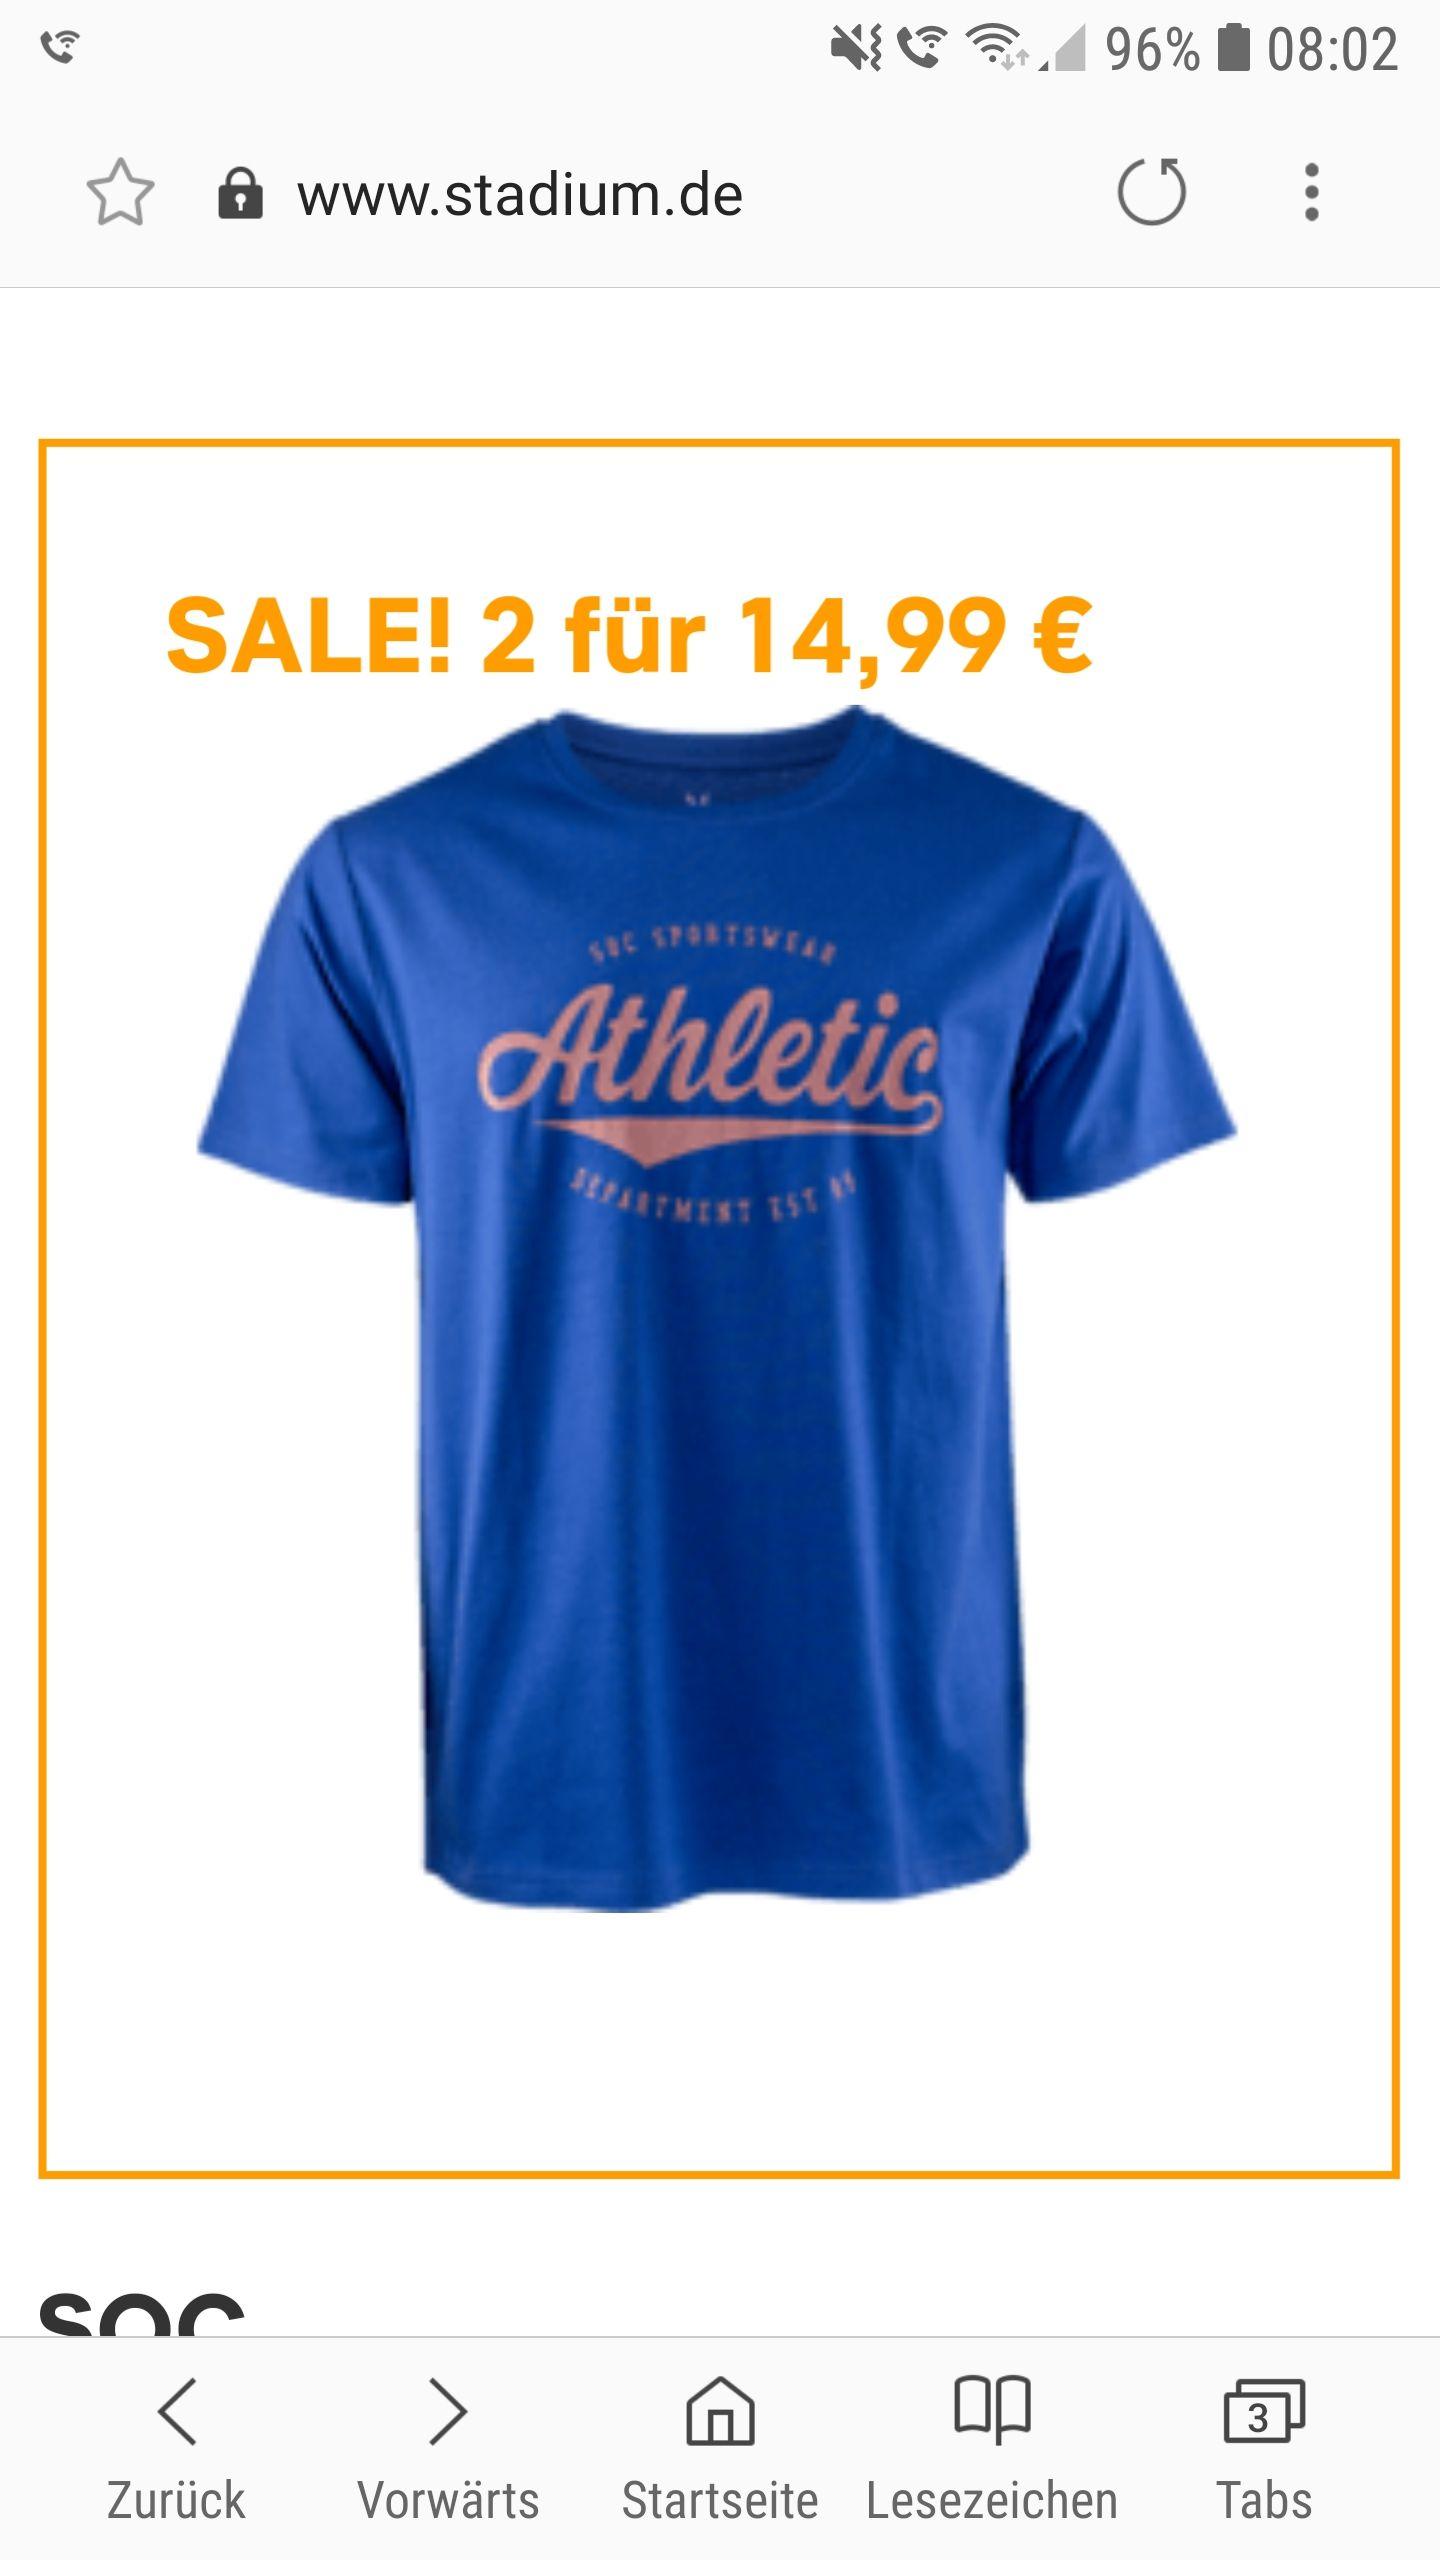 [STADIUM HH lokal] T-Shirt für 2,99€ Preisfehler